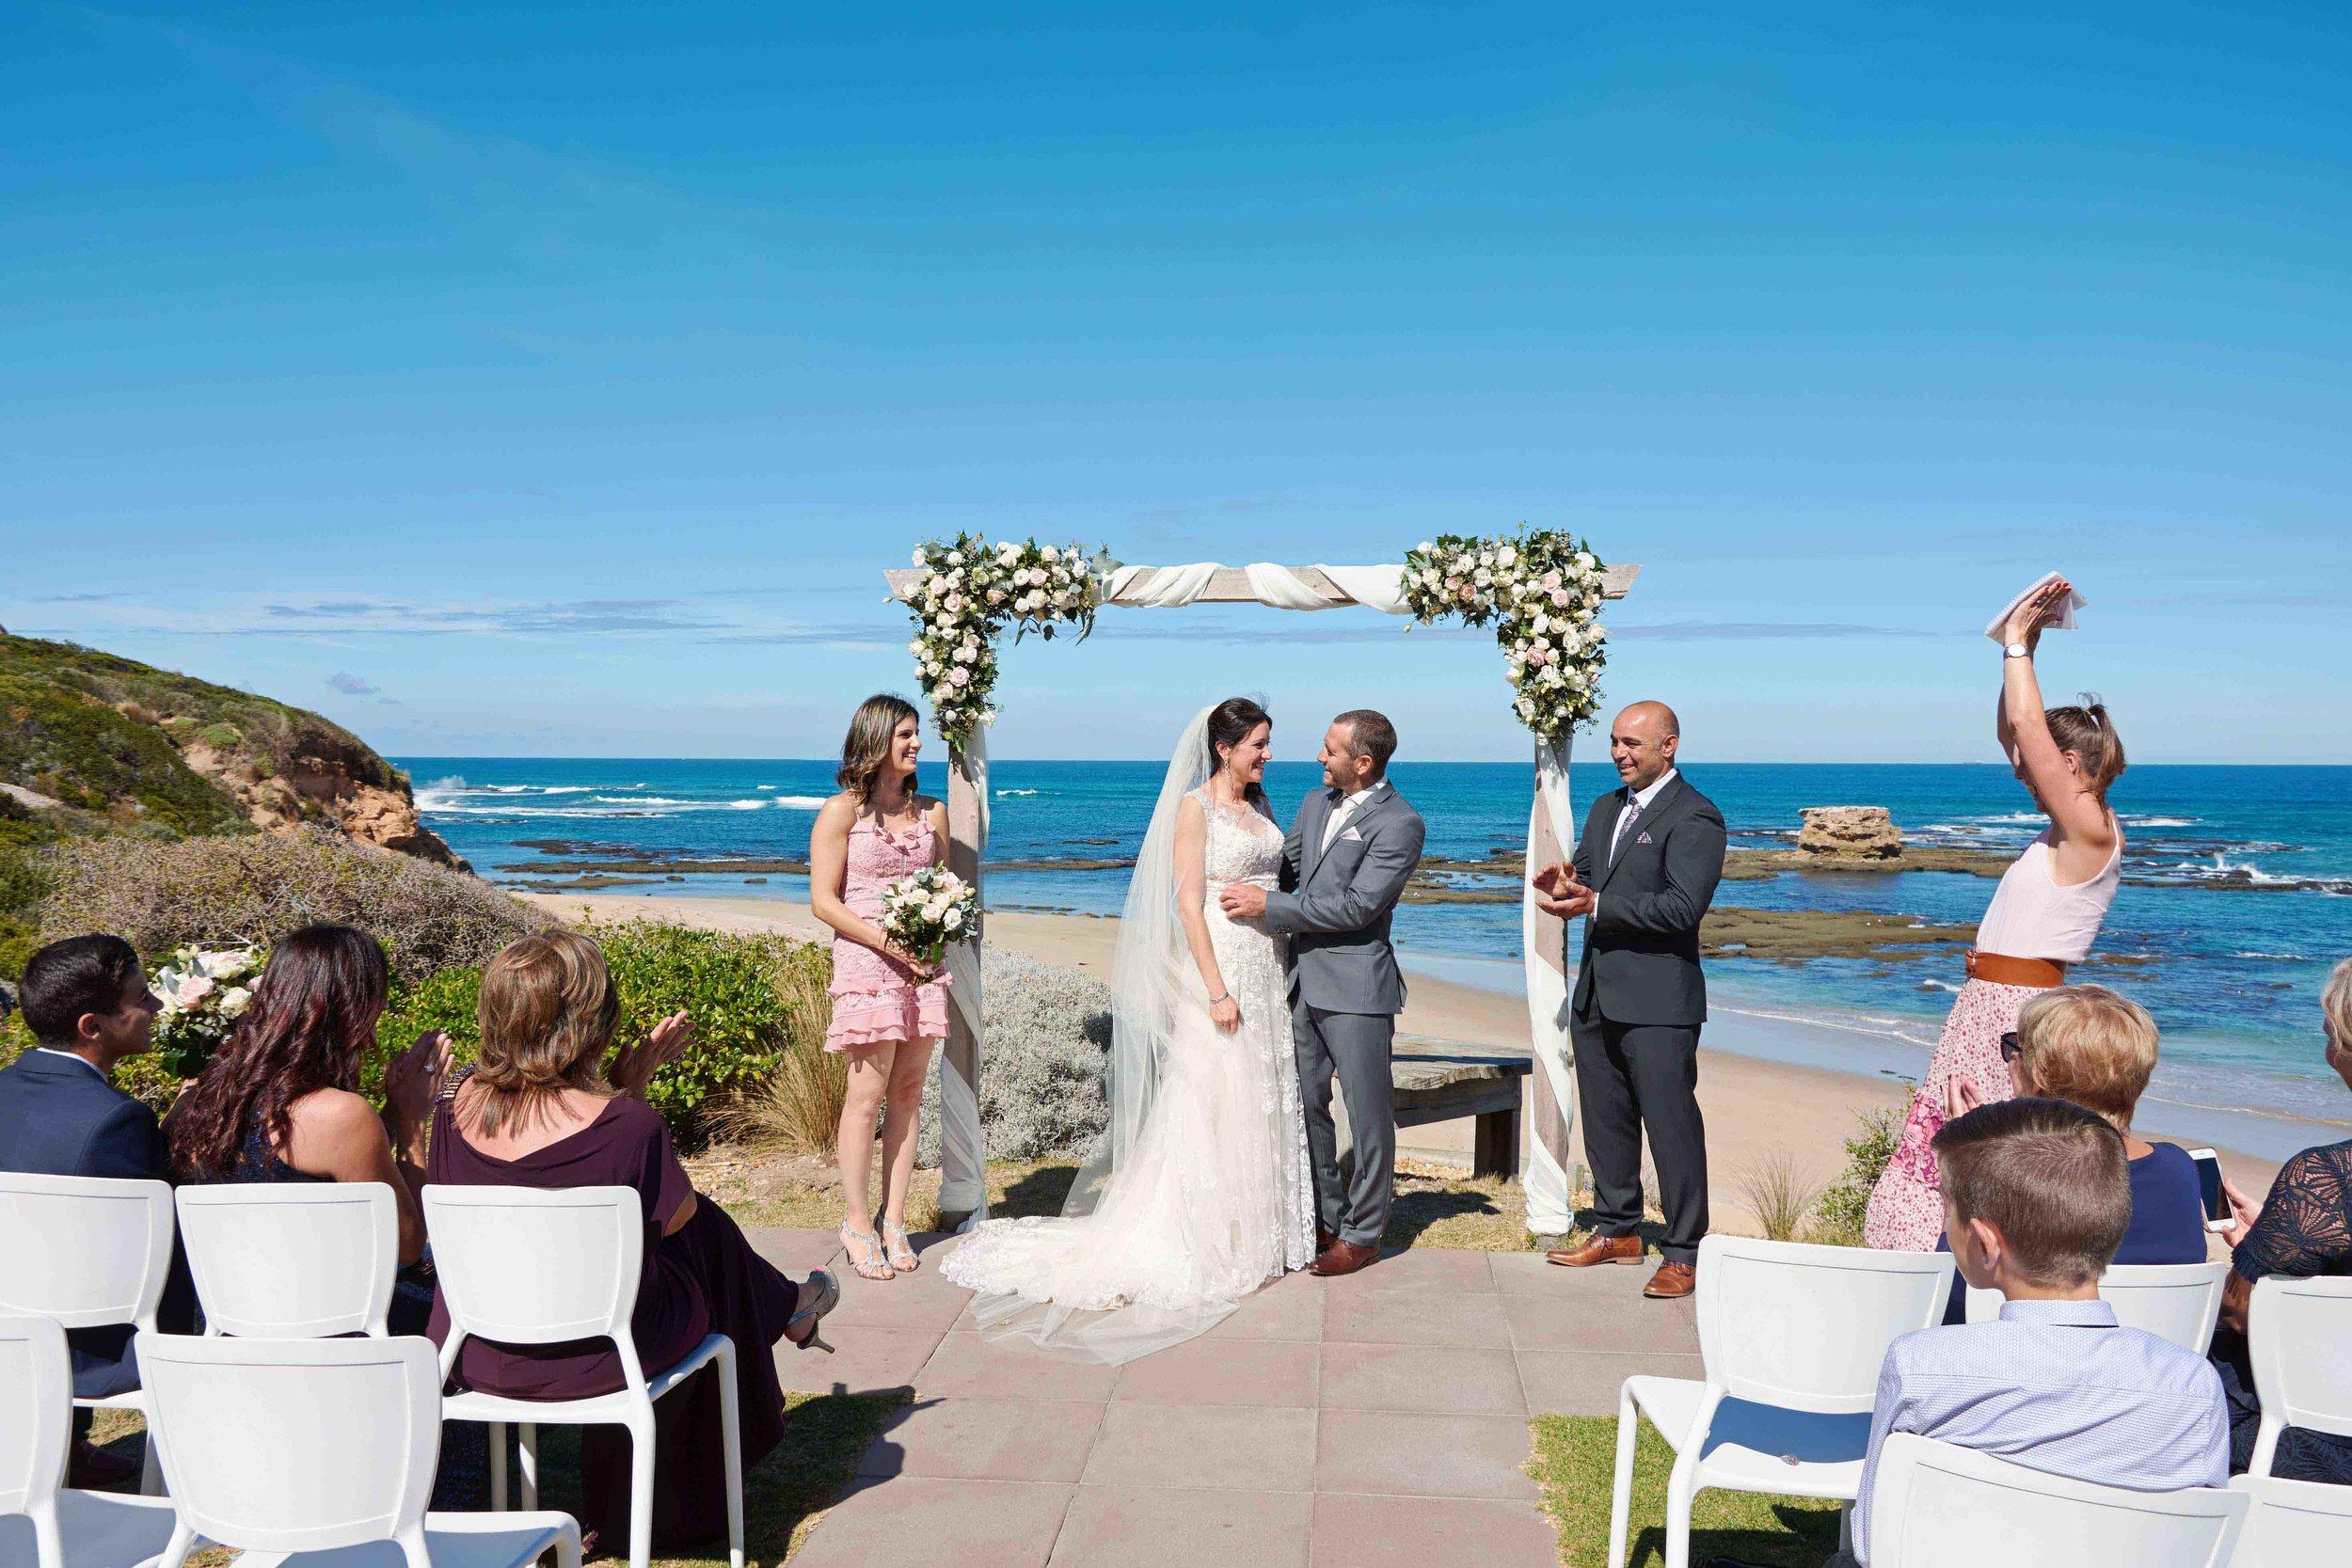 sorrento-wedding-photography-all-smiles-marissa-jade-photography-55.jpg